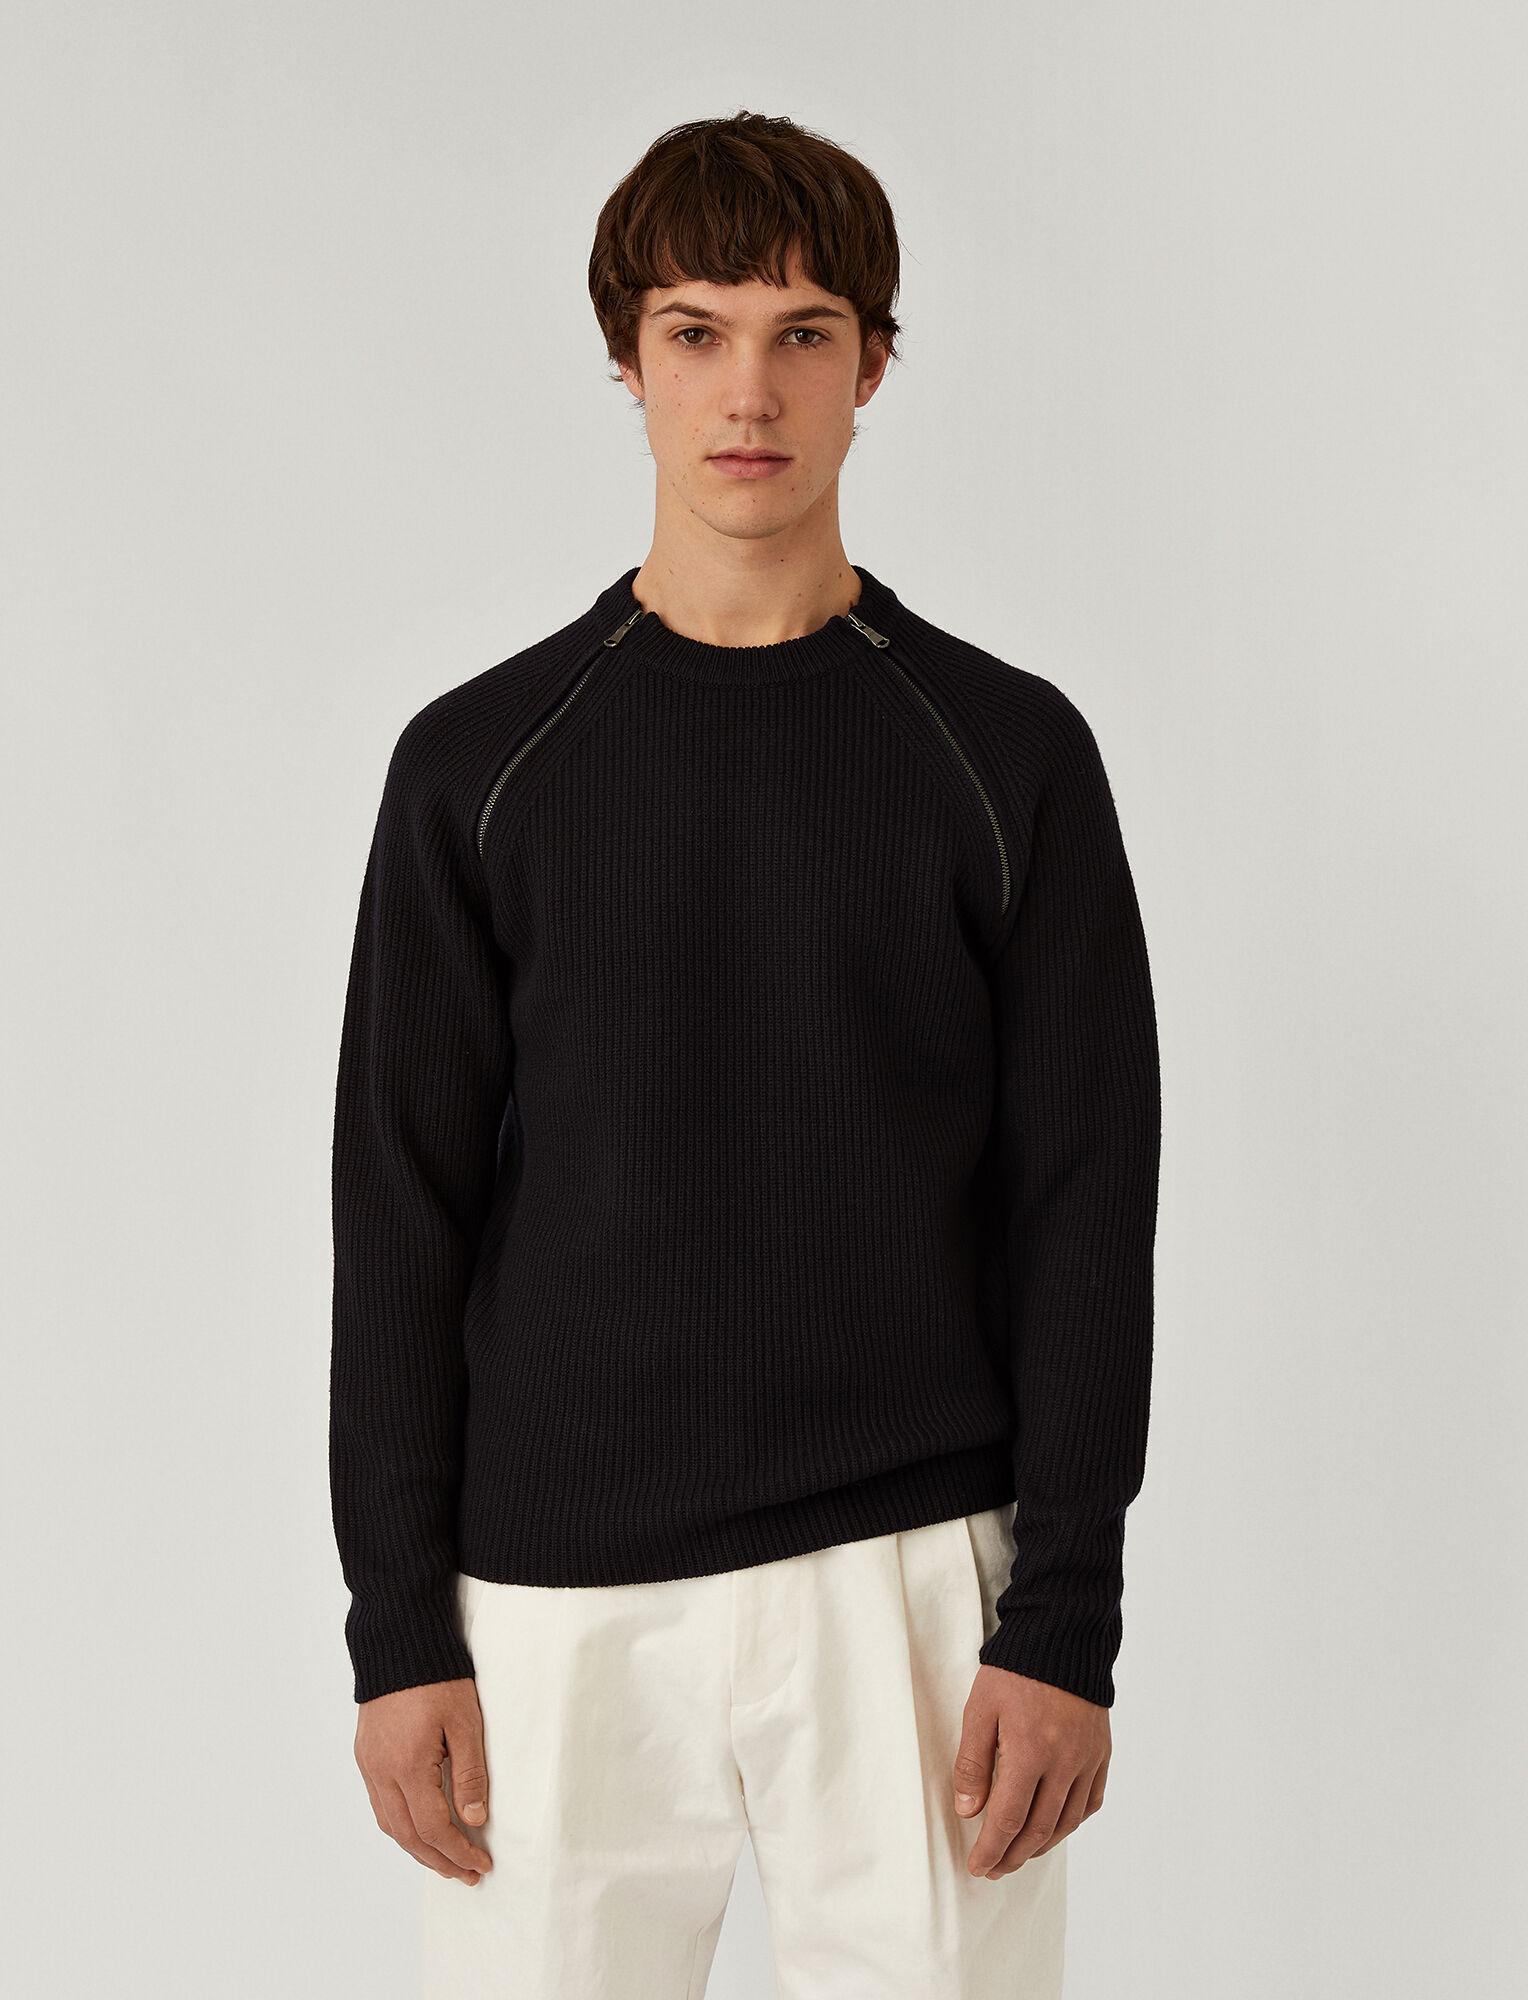 Joseph, Zip Merinos Knit, in Navy